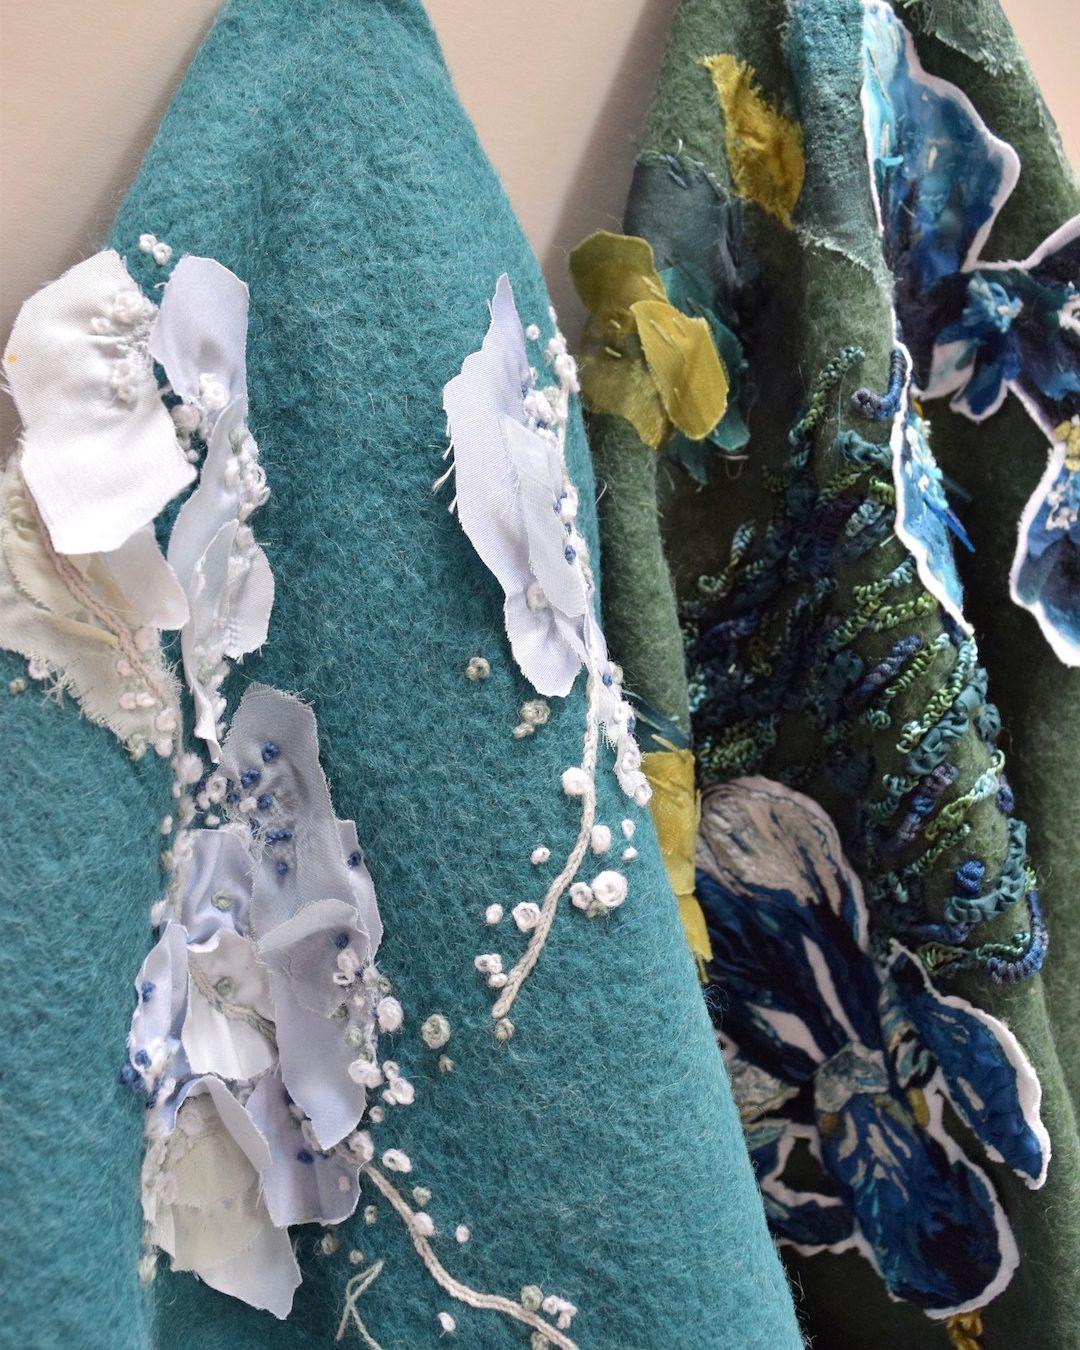 Into The Graden Formal Garden Blanket Embroidery 07